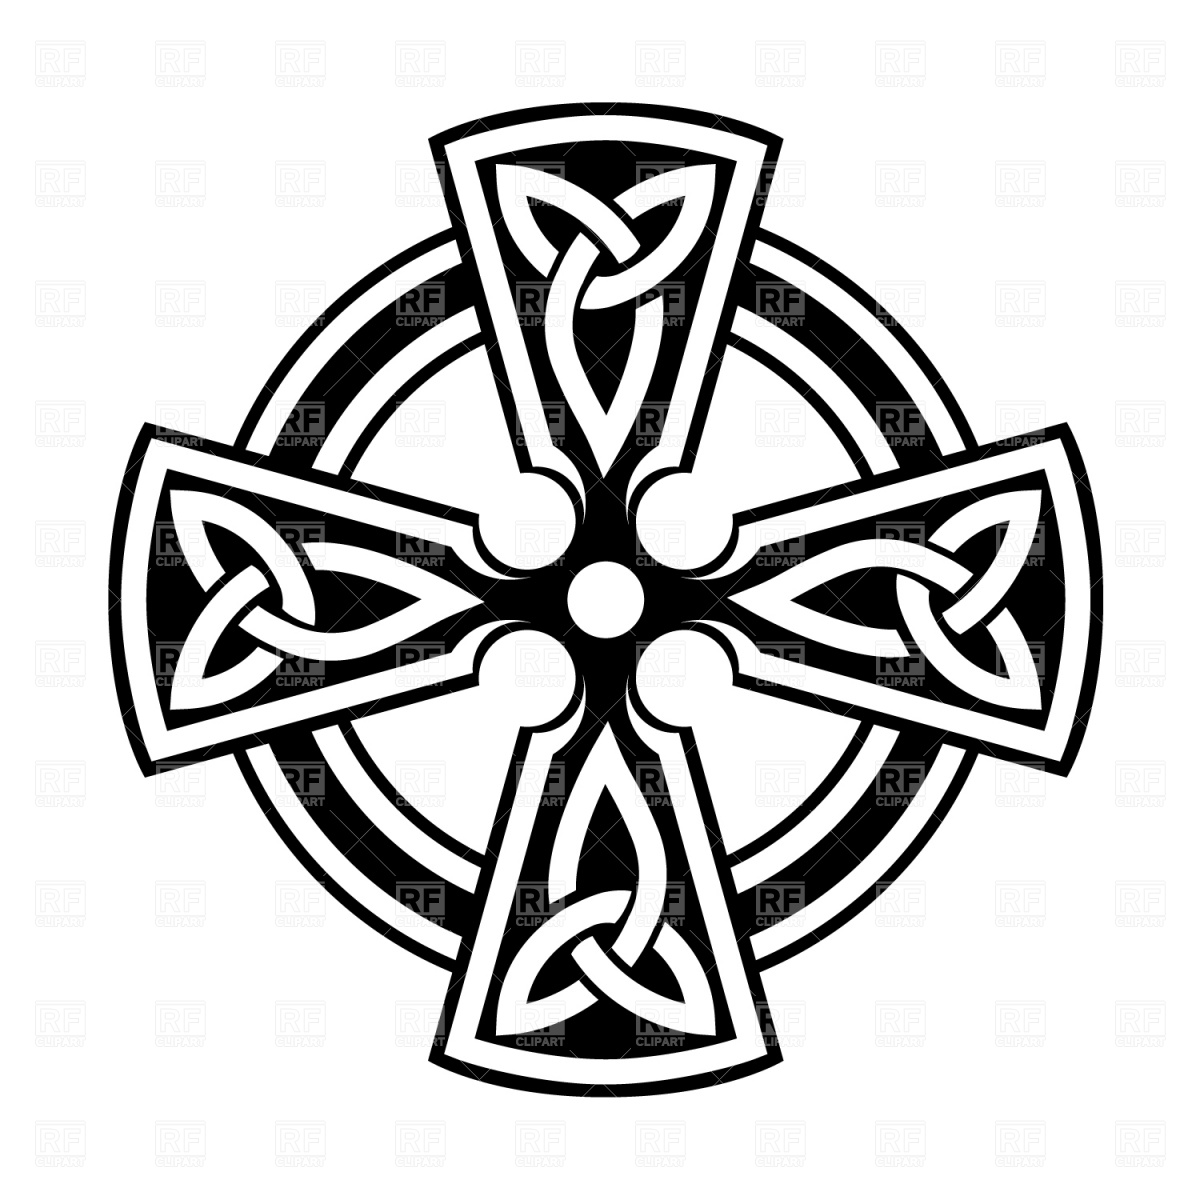 1200x1200 Celtic Cross Royalty Free Vector Clip Art Image